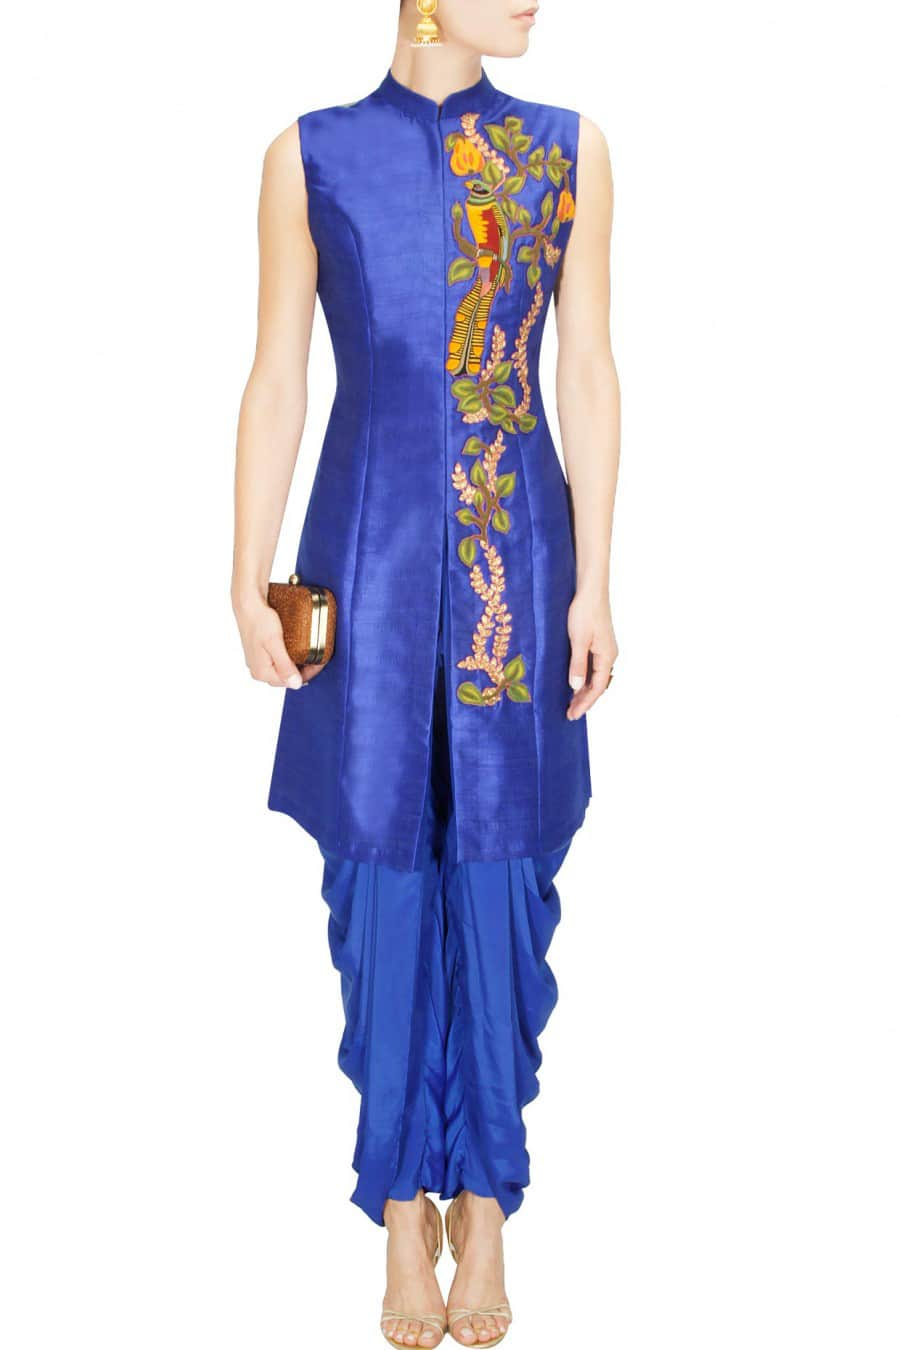 blue achkan with dhoti pants